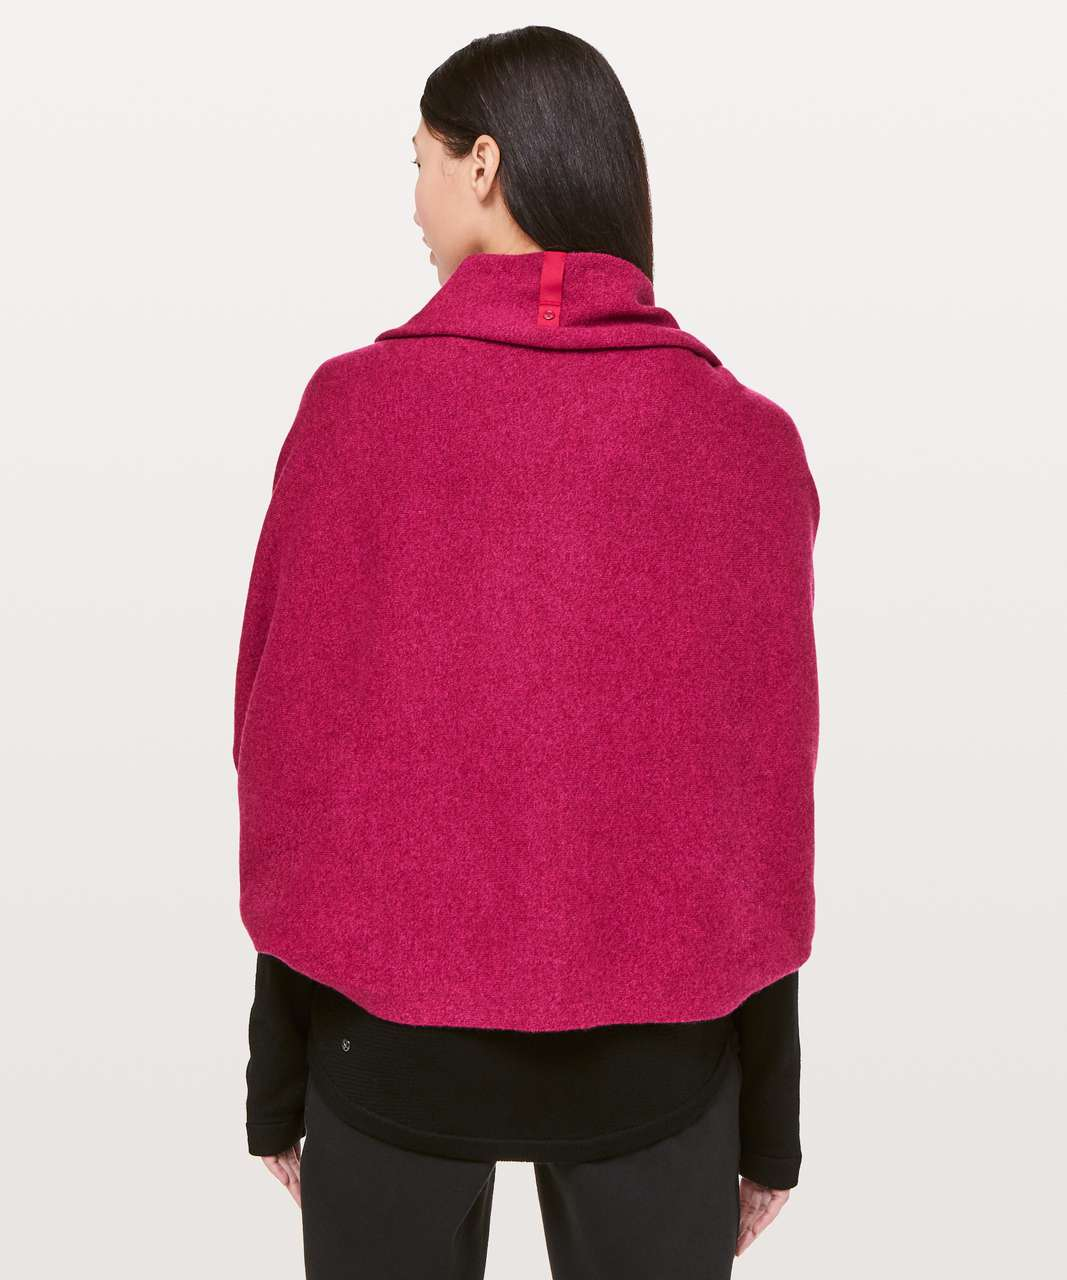 Lululemon Vinyasa Scarf *Cashmere - Heathered Dark Red